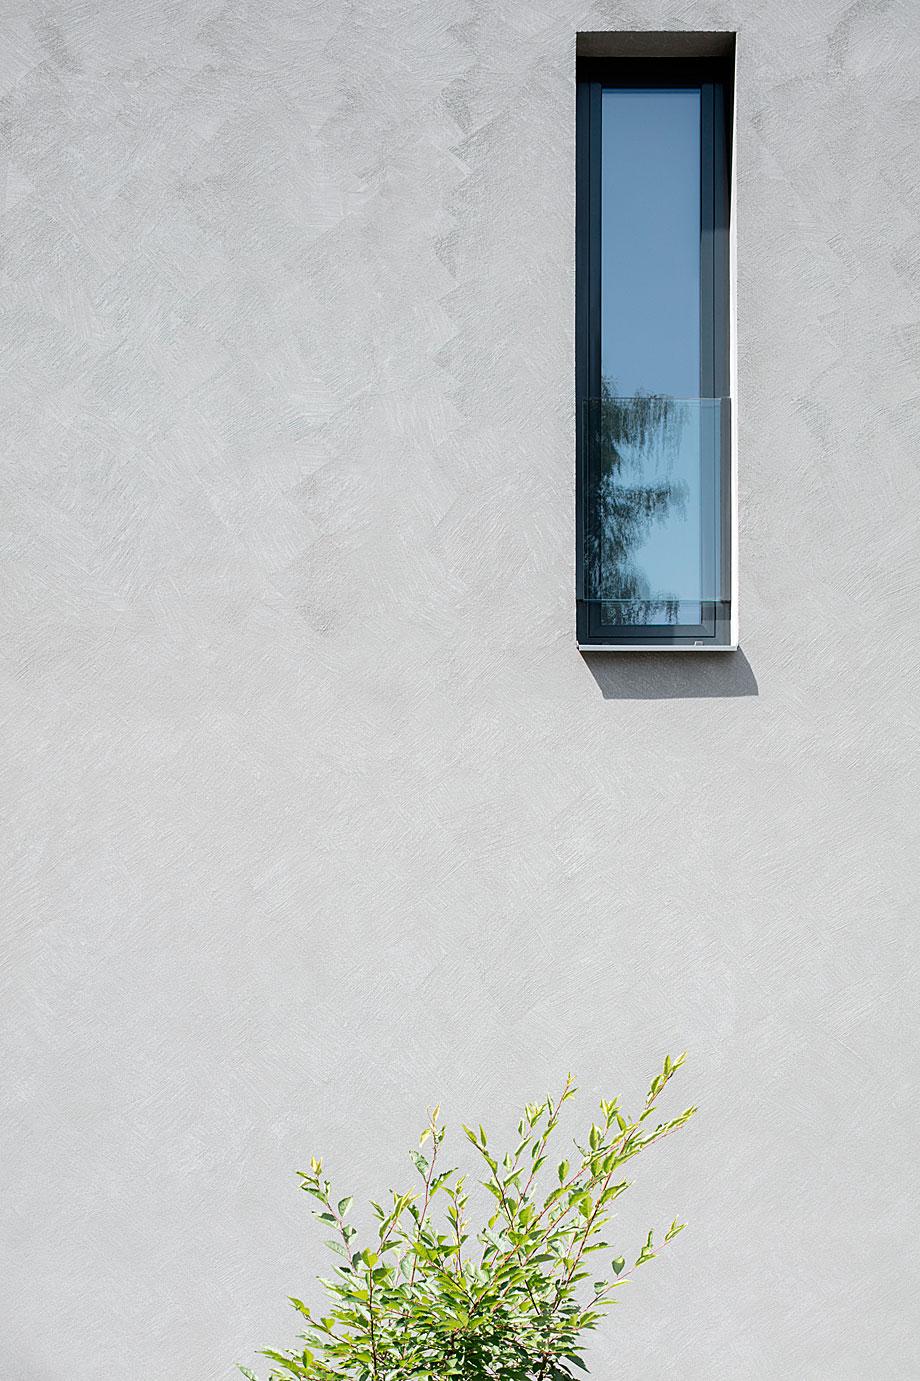 casa-unifamiliar-klanovice-adr-architects-19